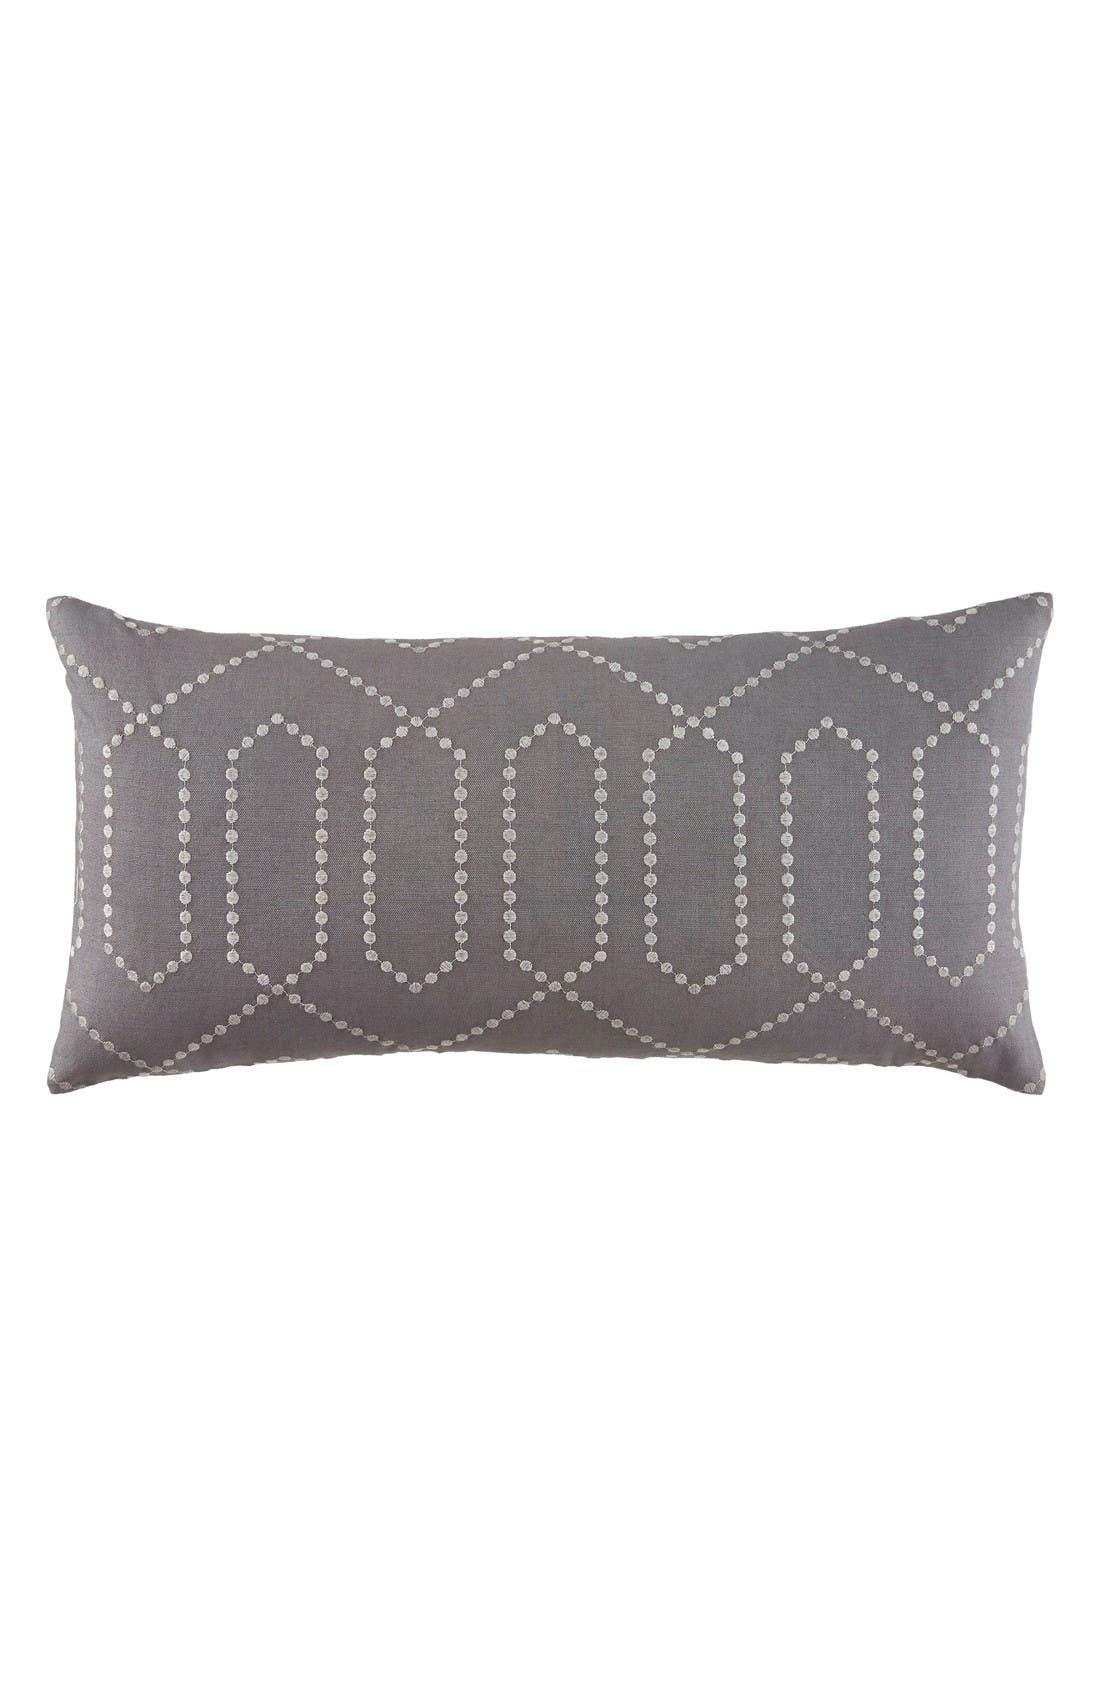 Decor Trellis Accent Pillow,                             Main thumbnail 1, color,                             Grey